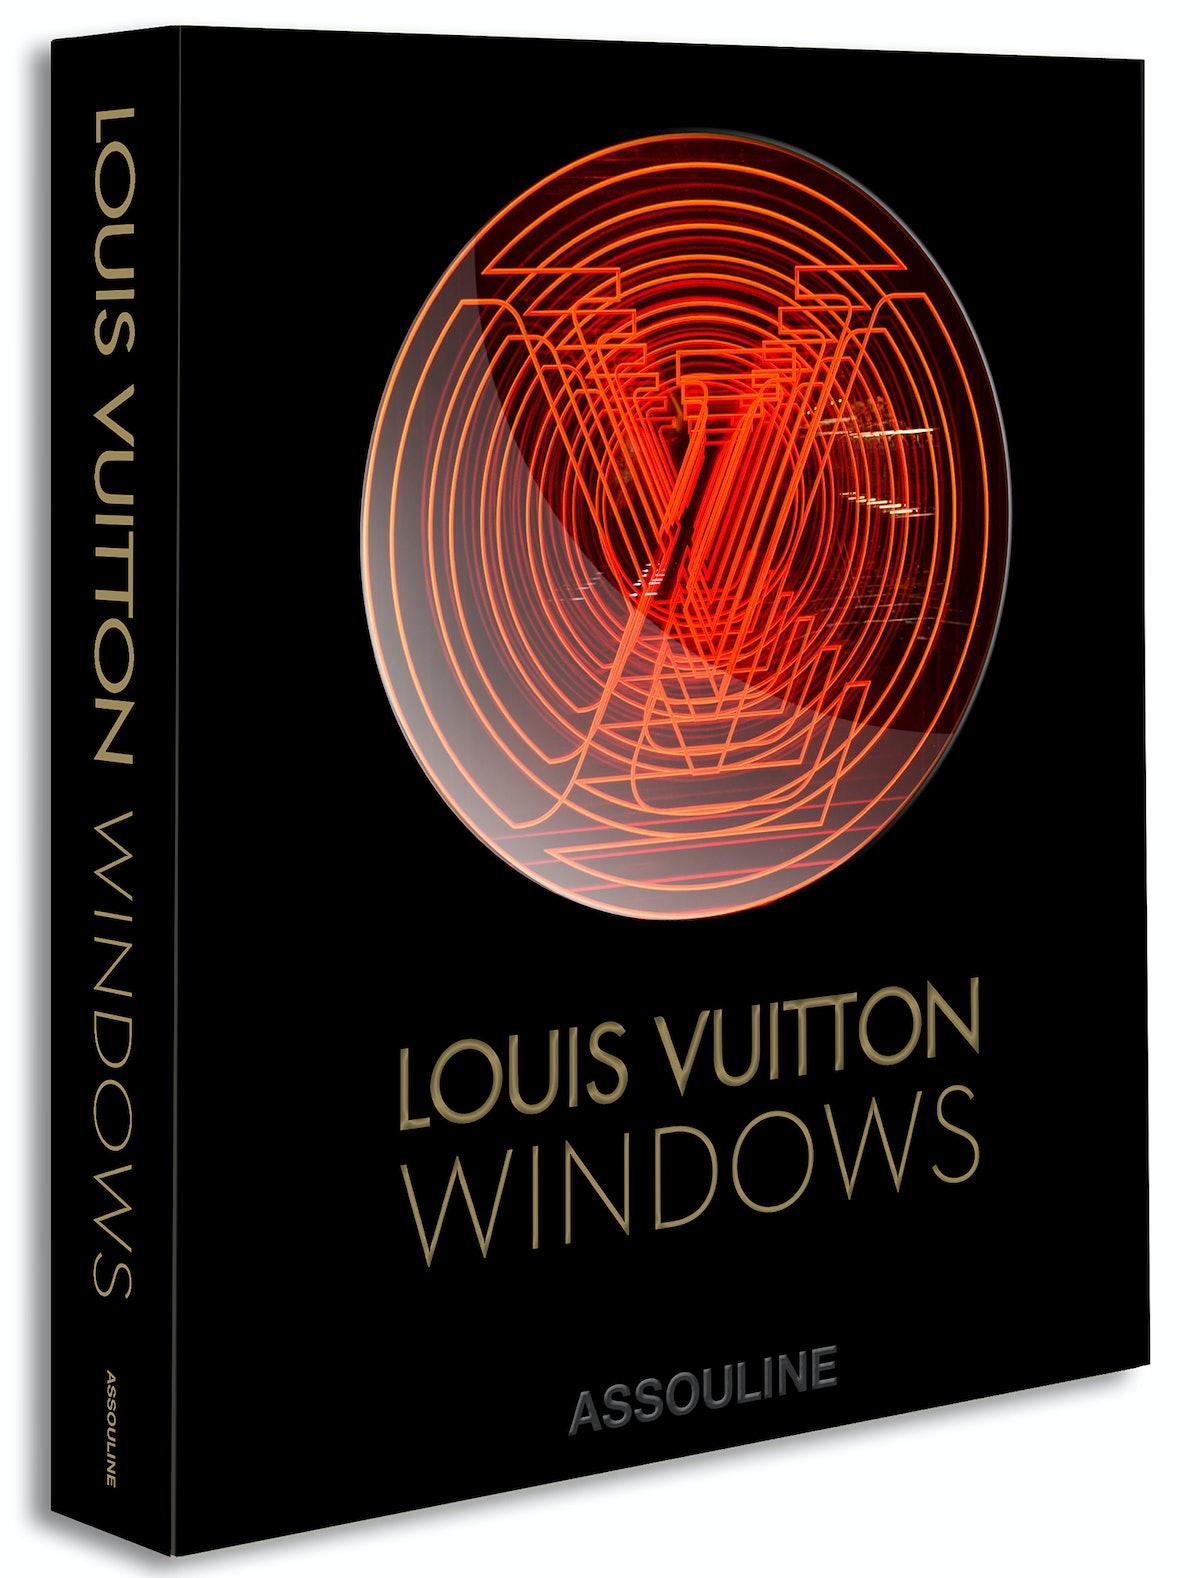 Louis Vuitton Windows 3D